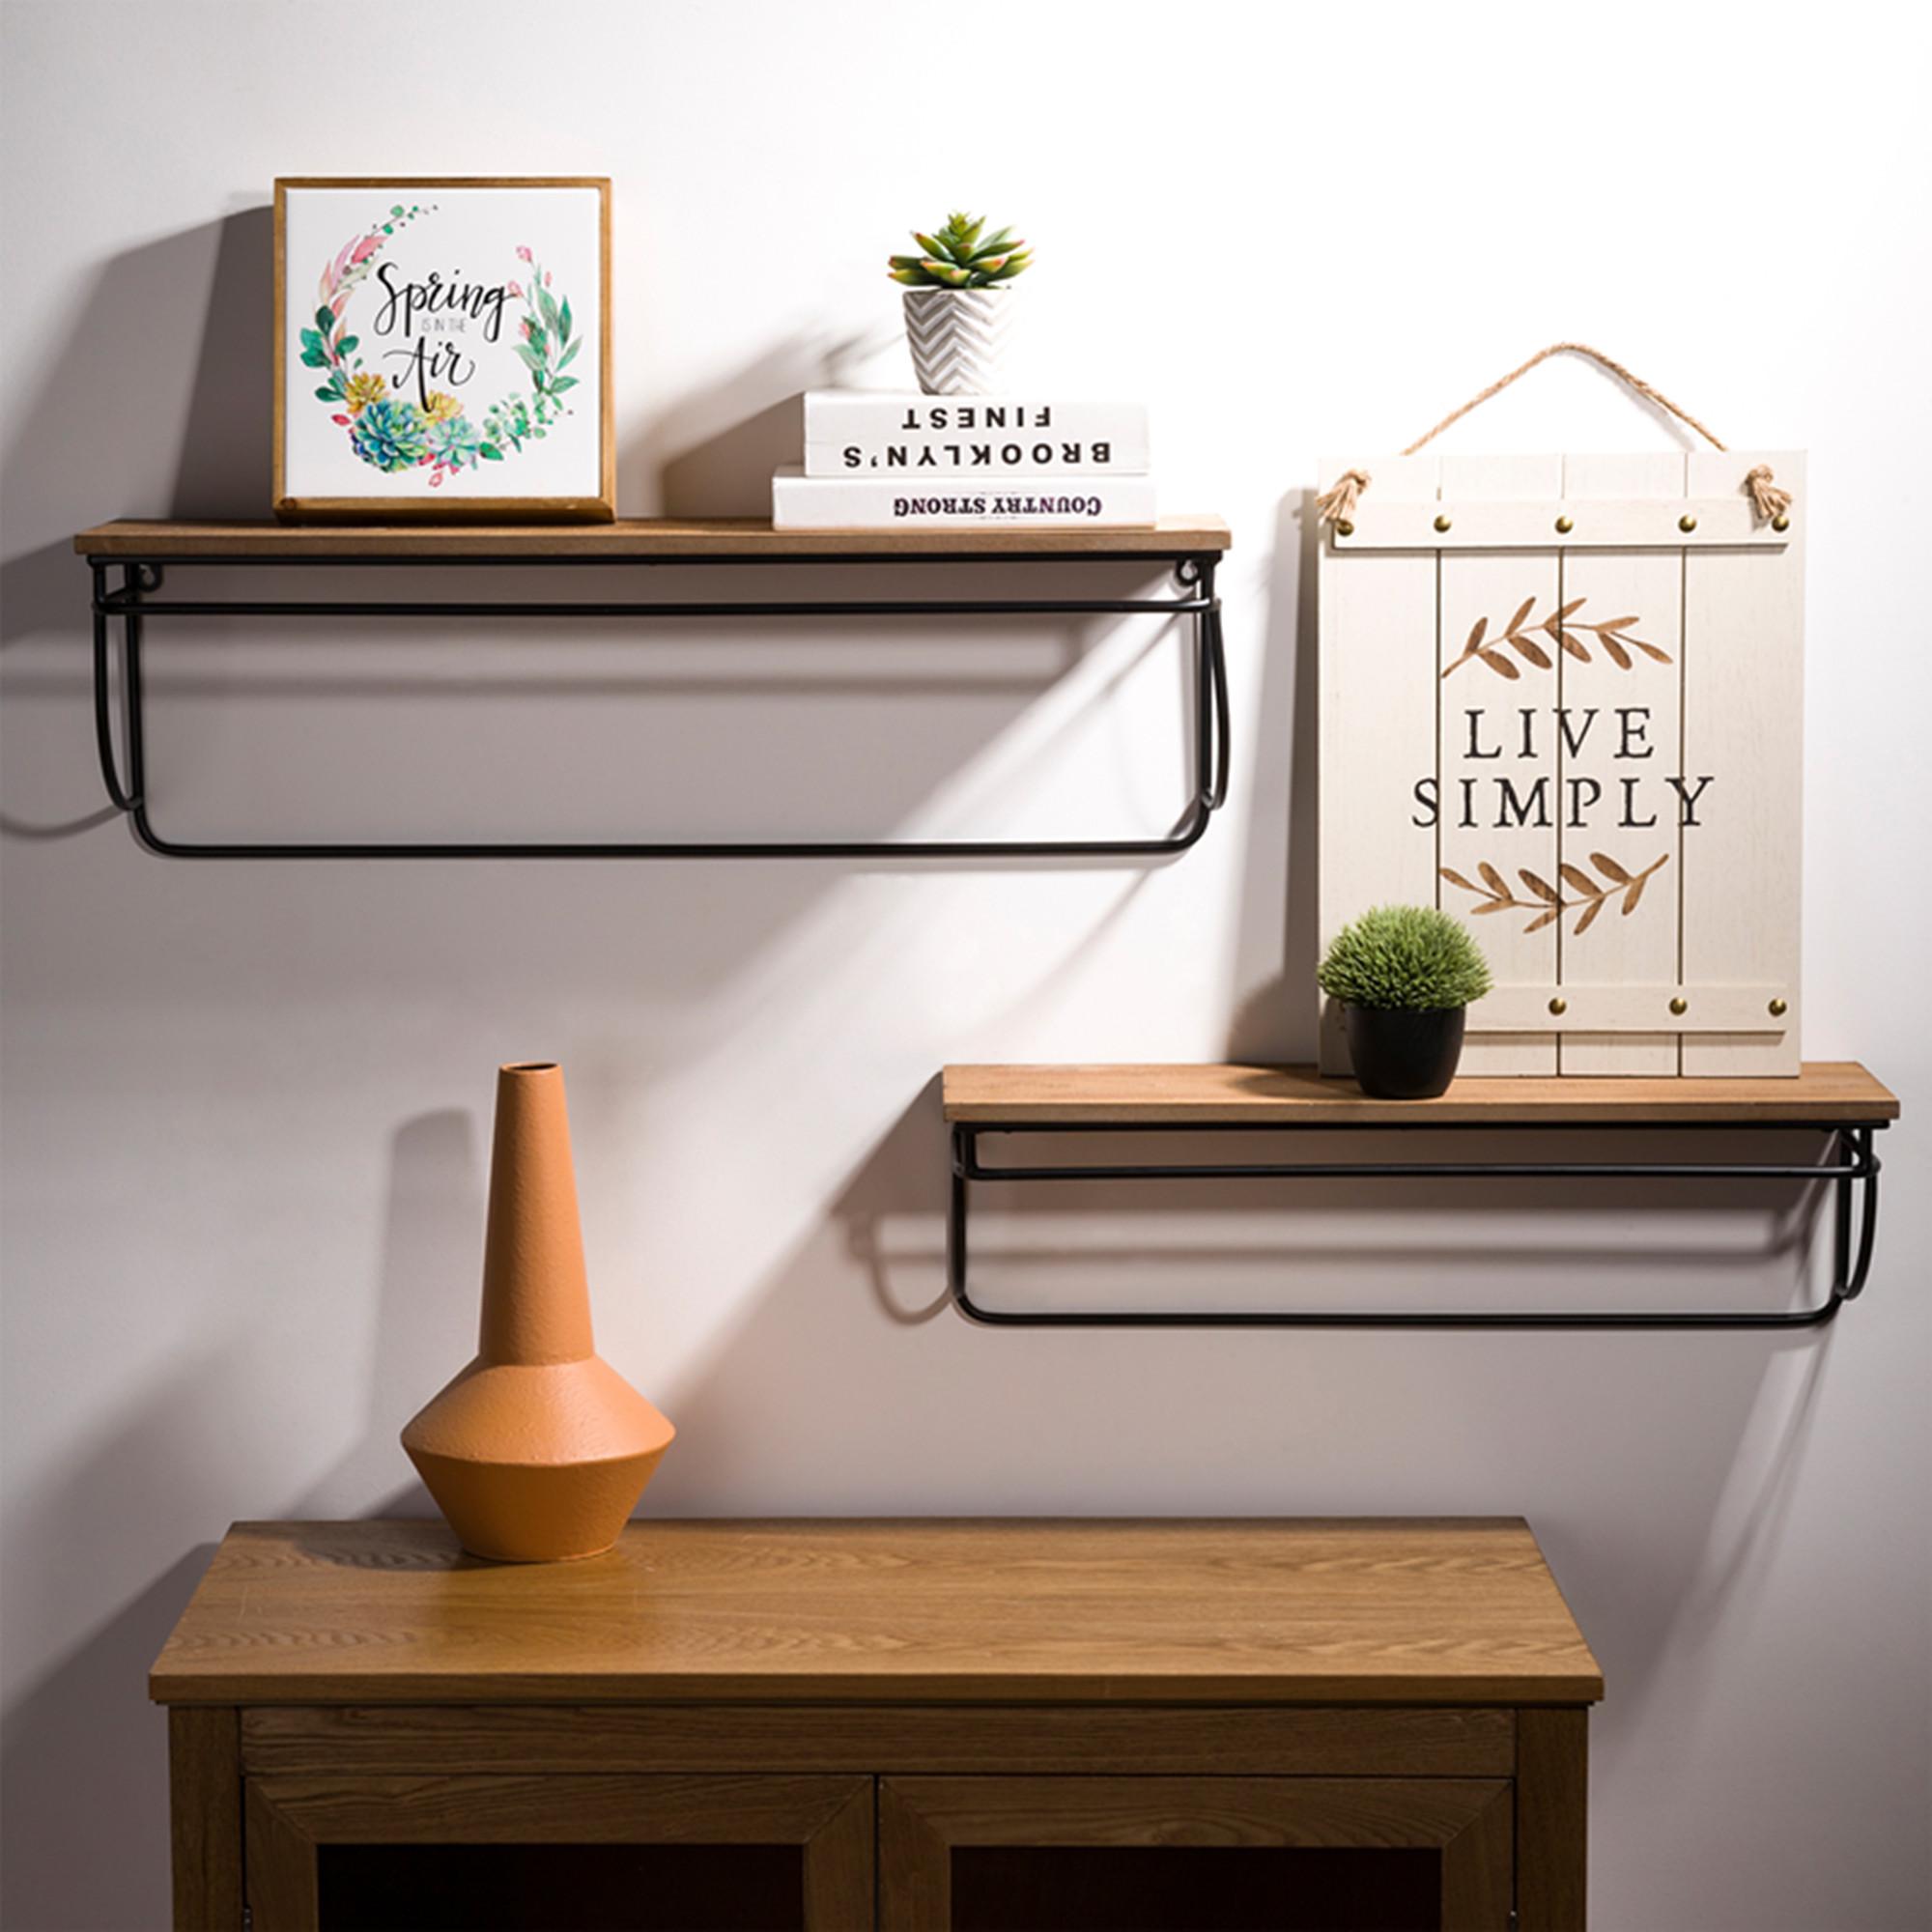 Details about Glitzhome 2PCS Floating Wall Shelves Rustic Wood Display  Shelf Living Room Decor